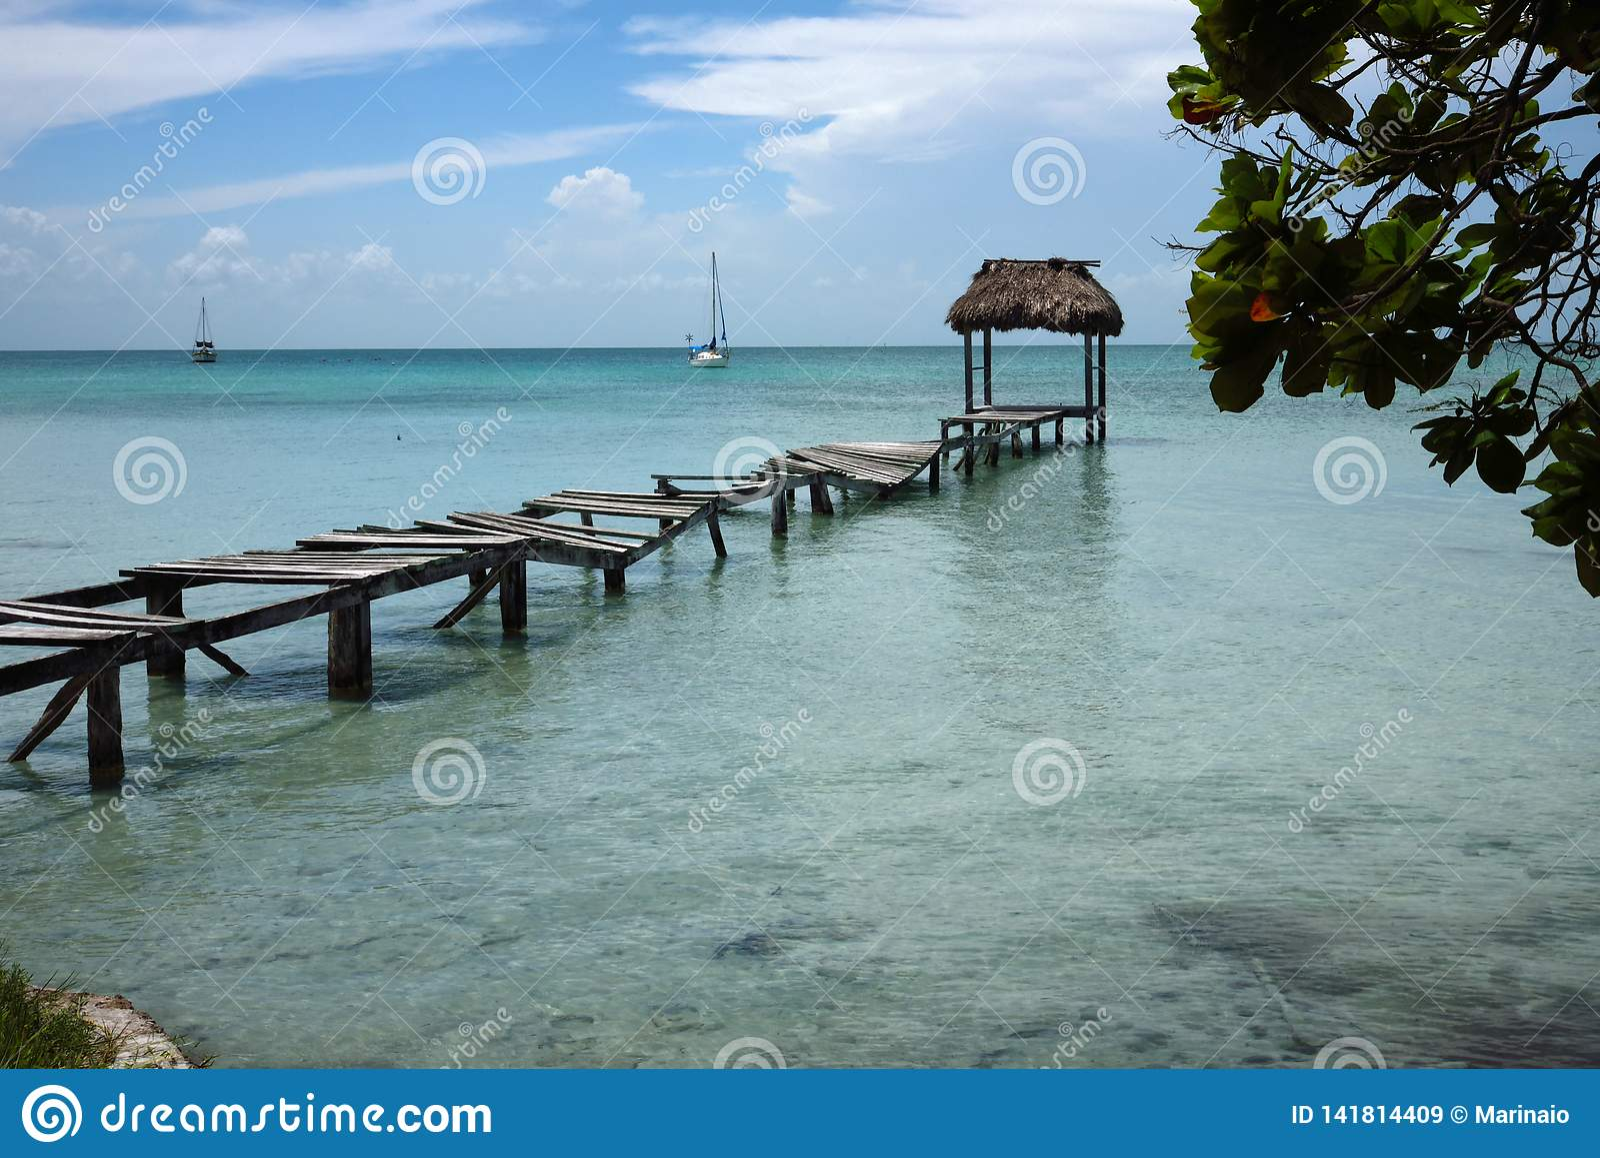 Sarteneja village in Belize.